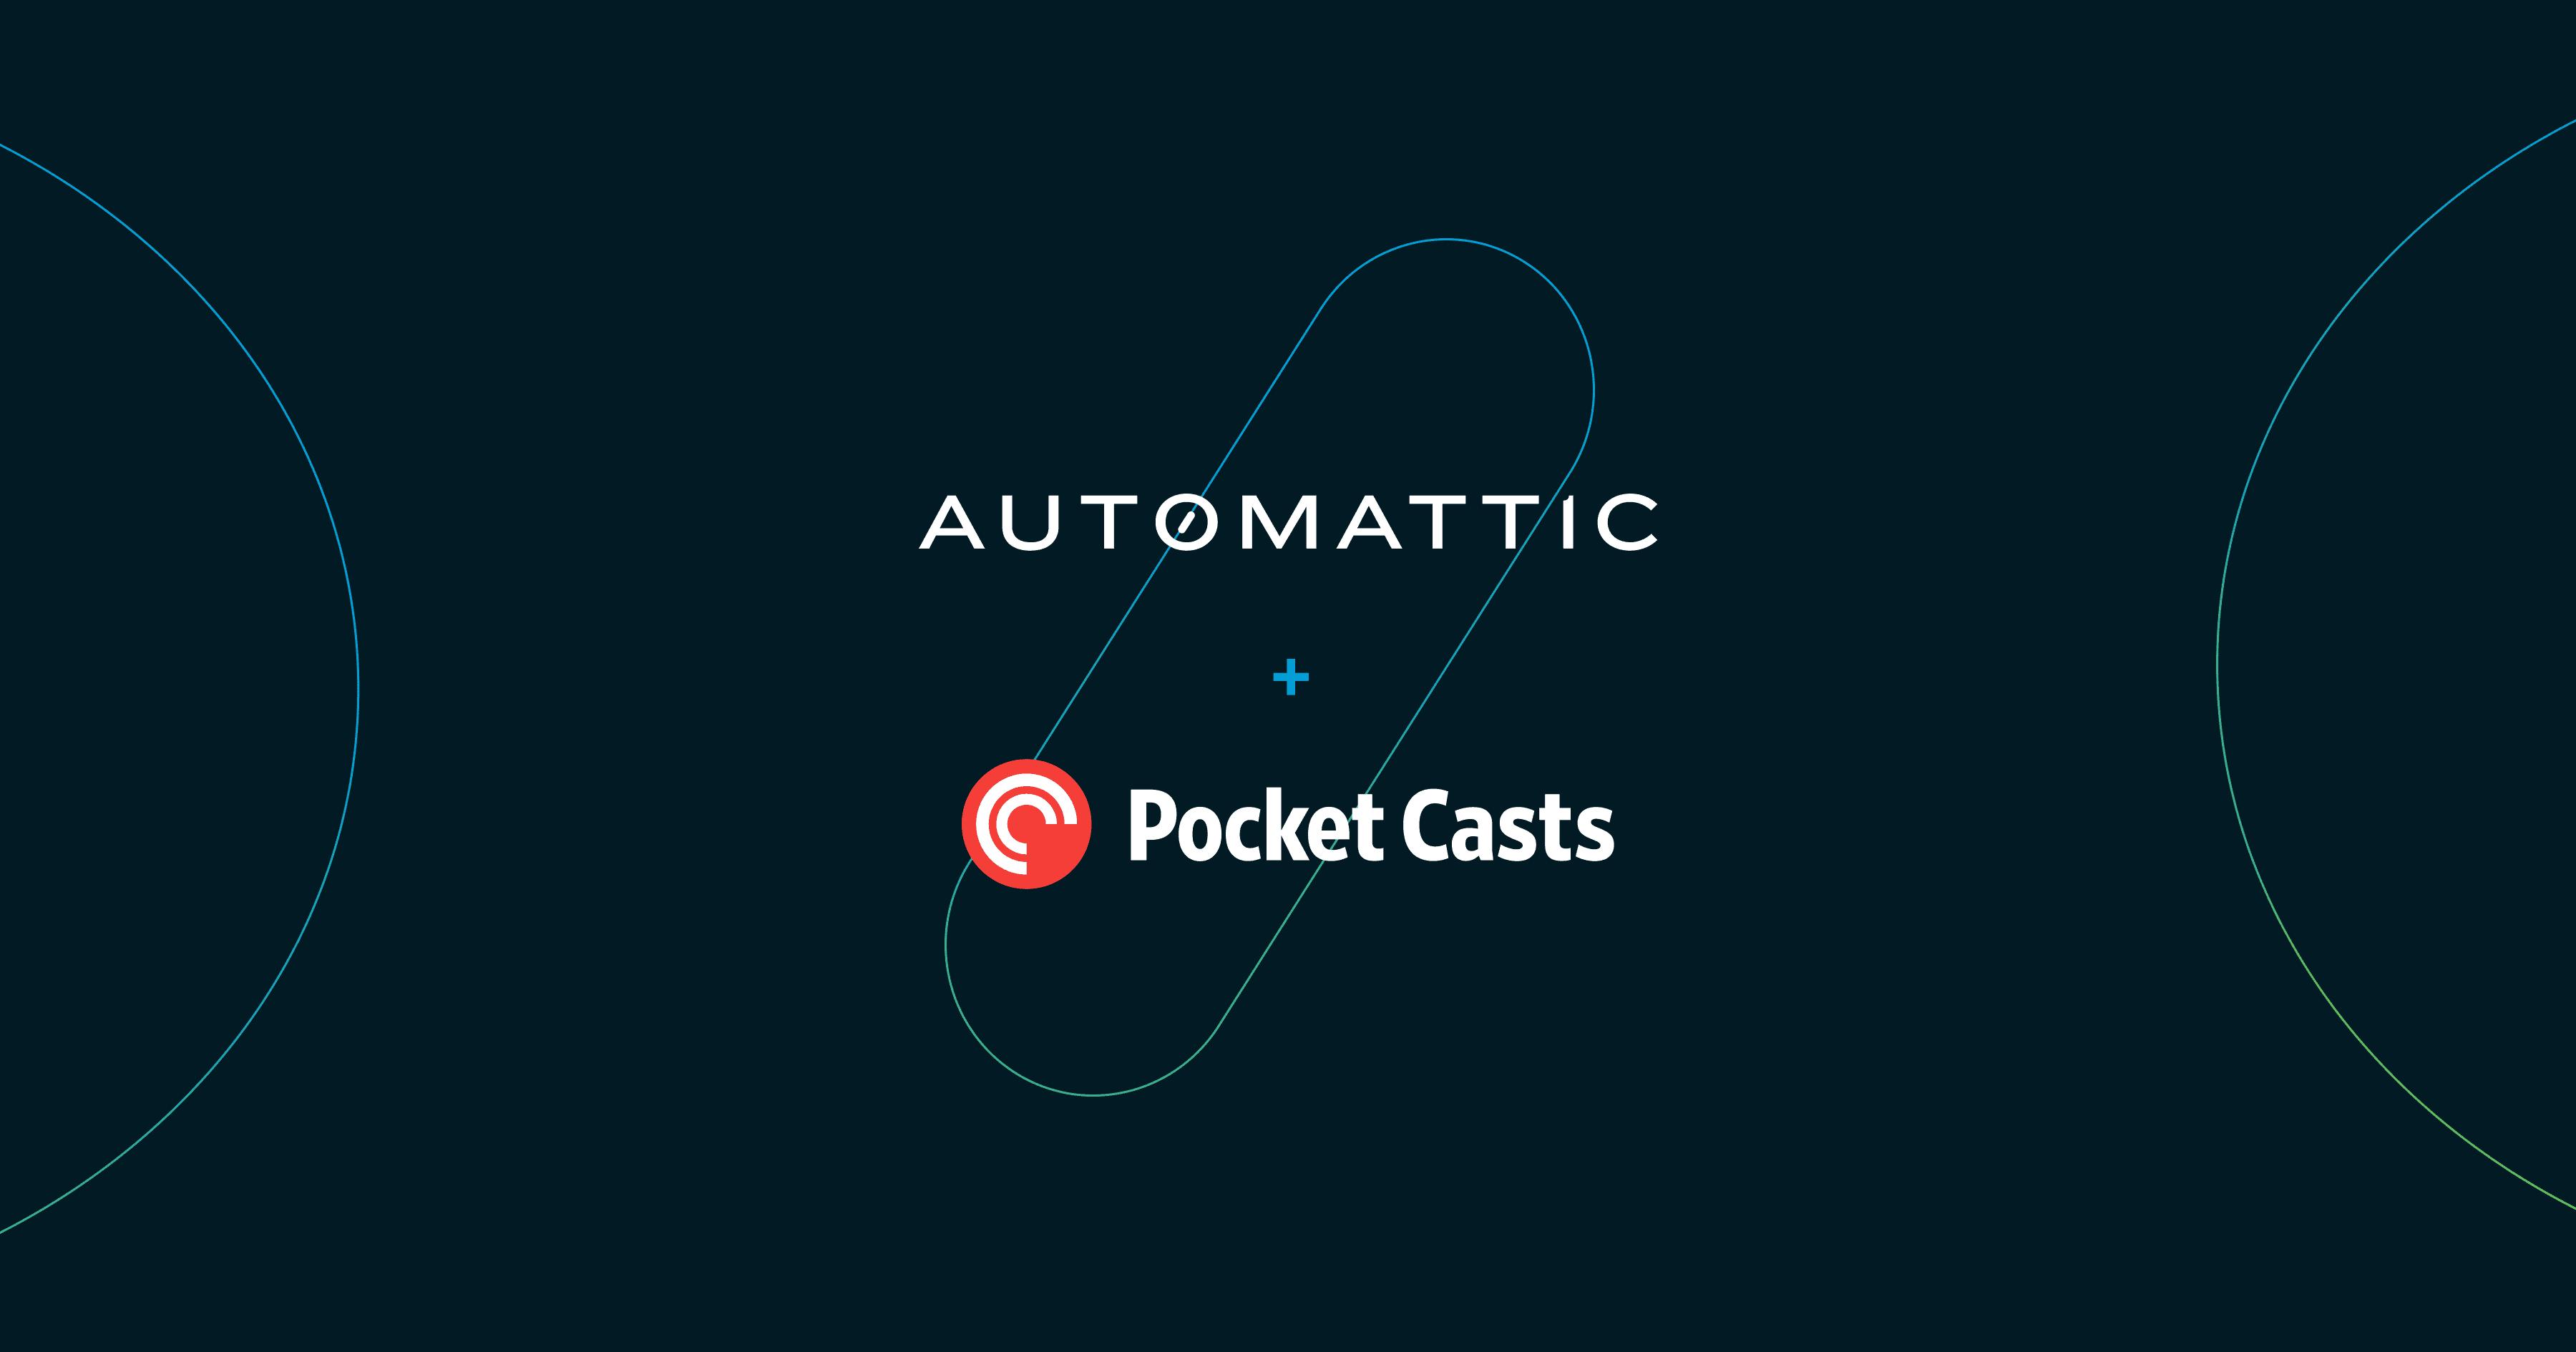 a8c-pocket-casts logo